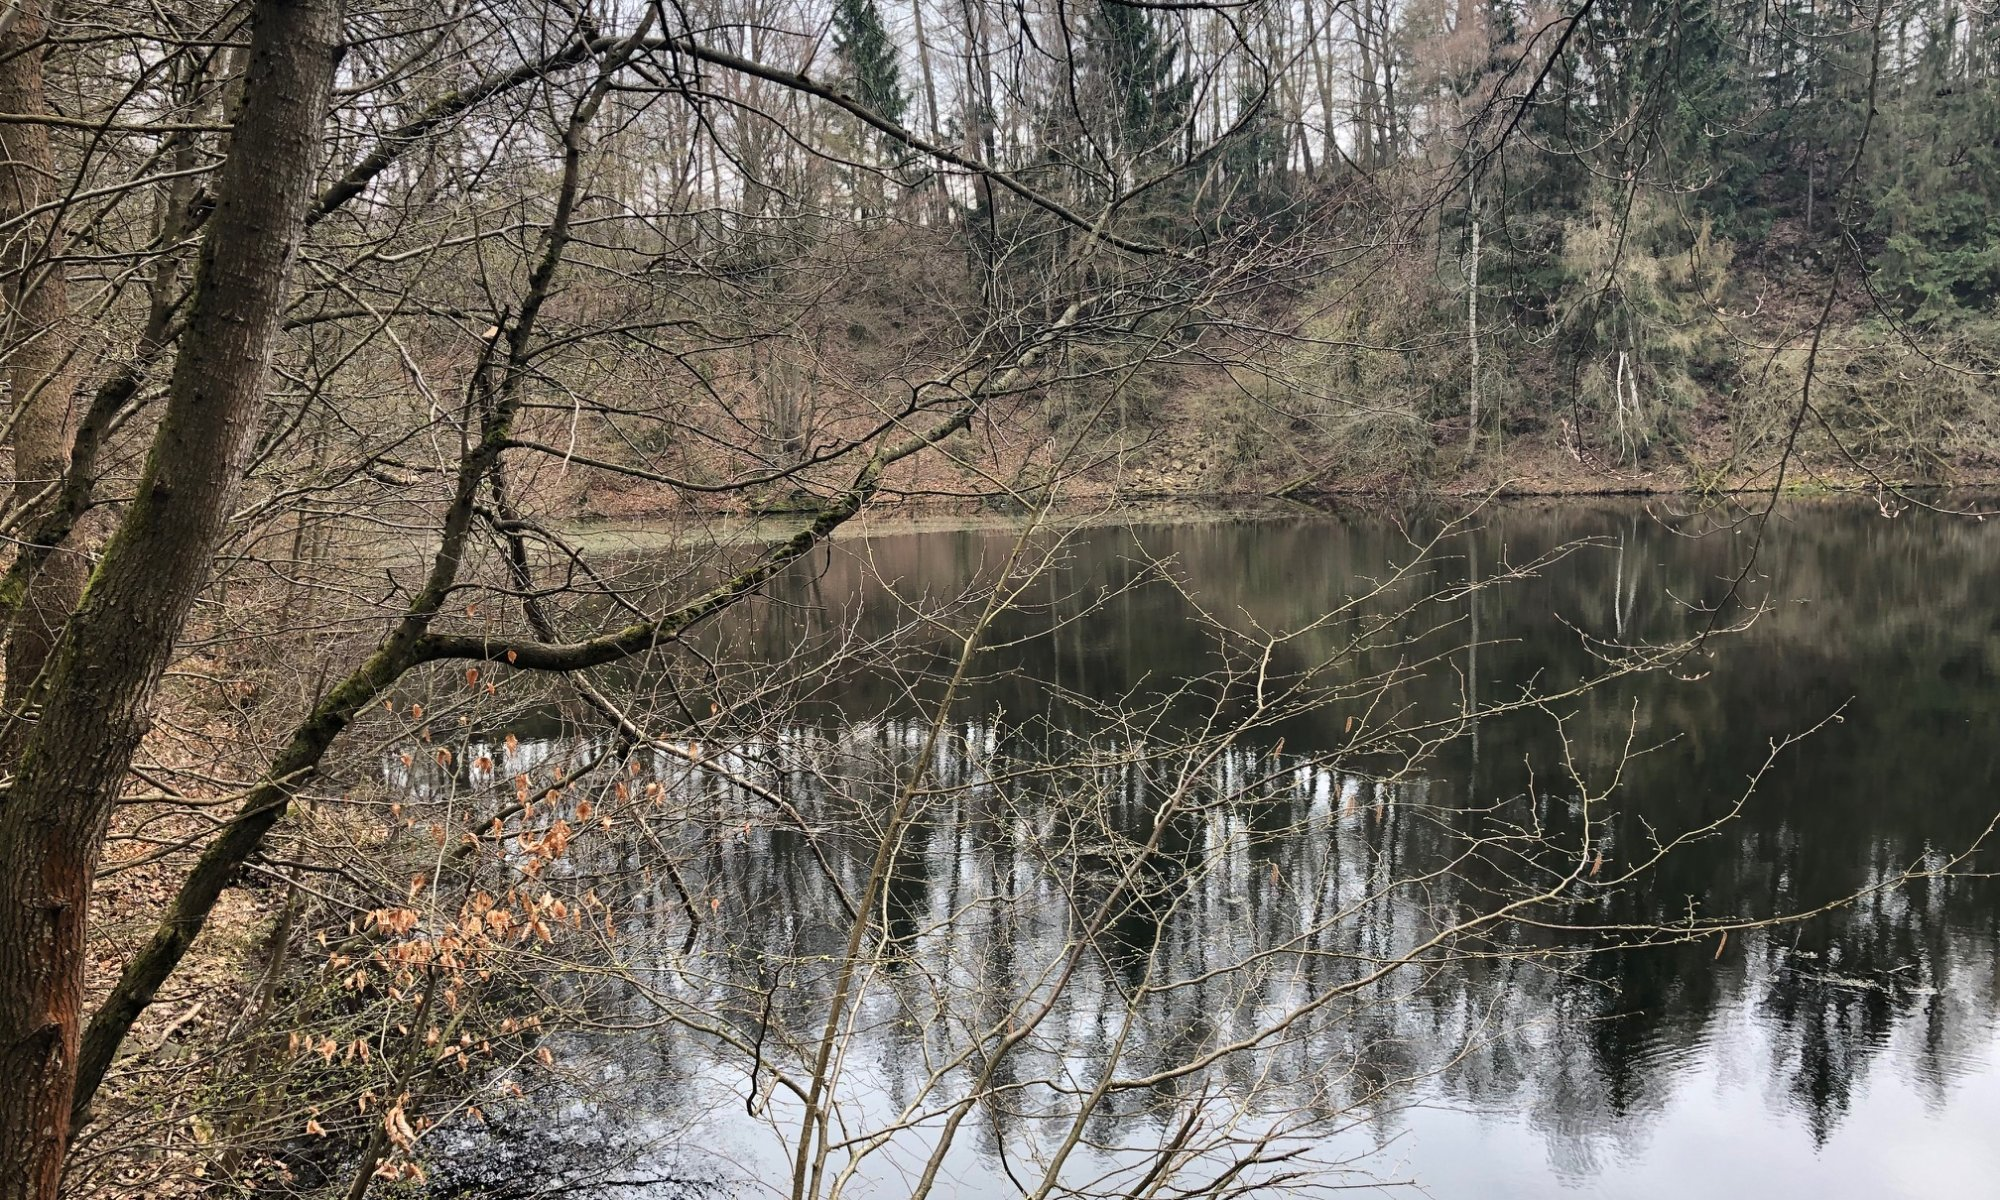 Silbersee, Habichtswald, Kassel